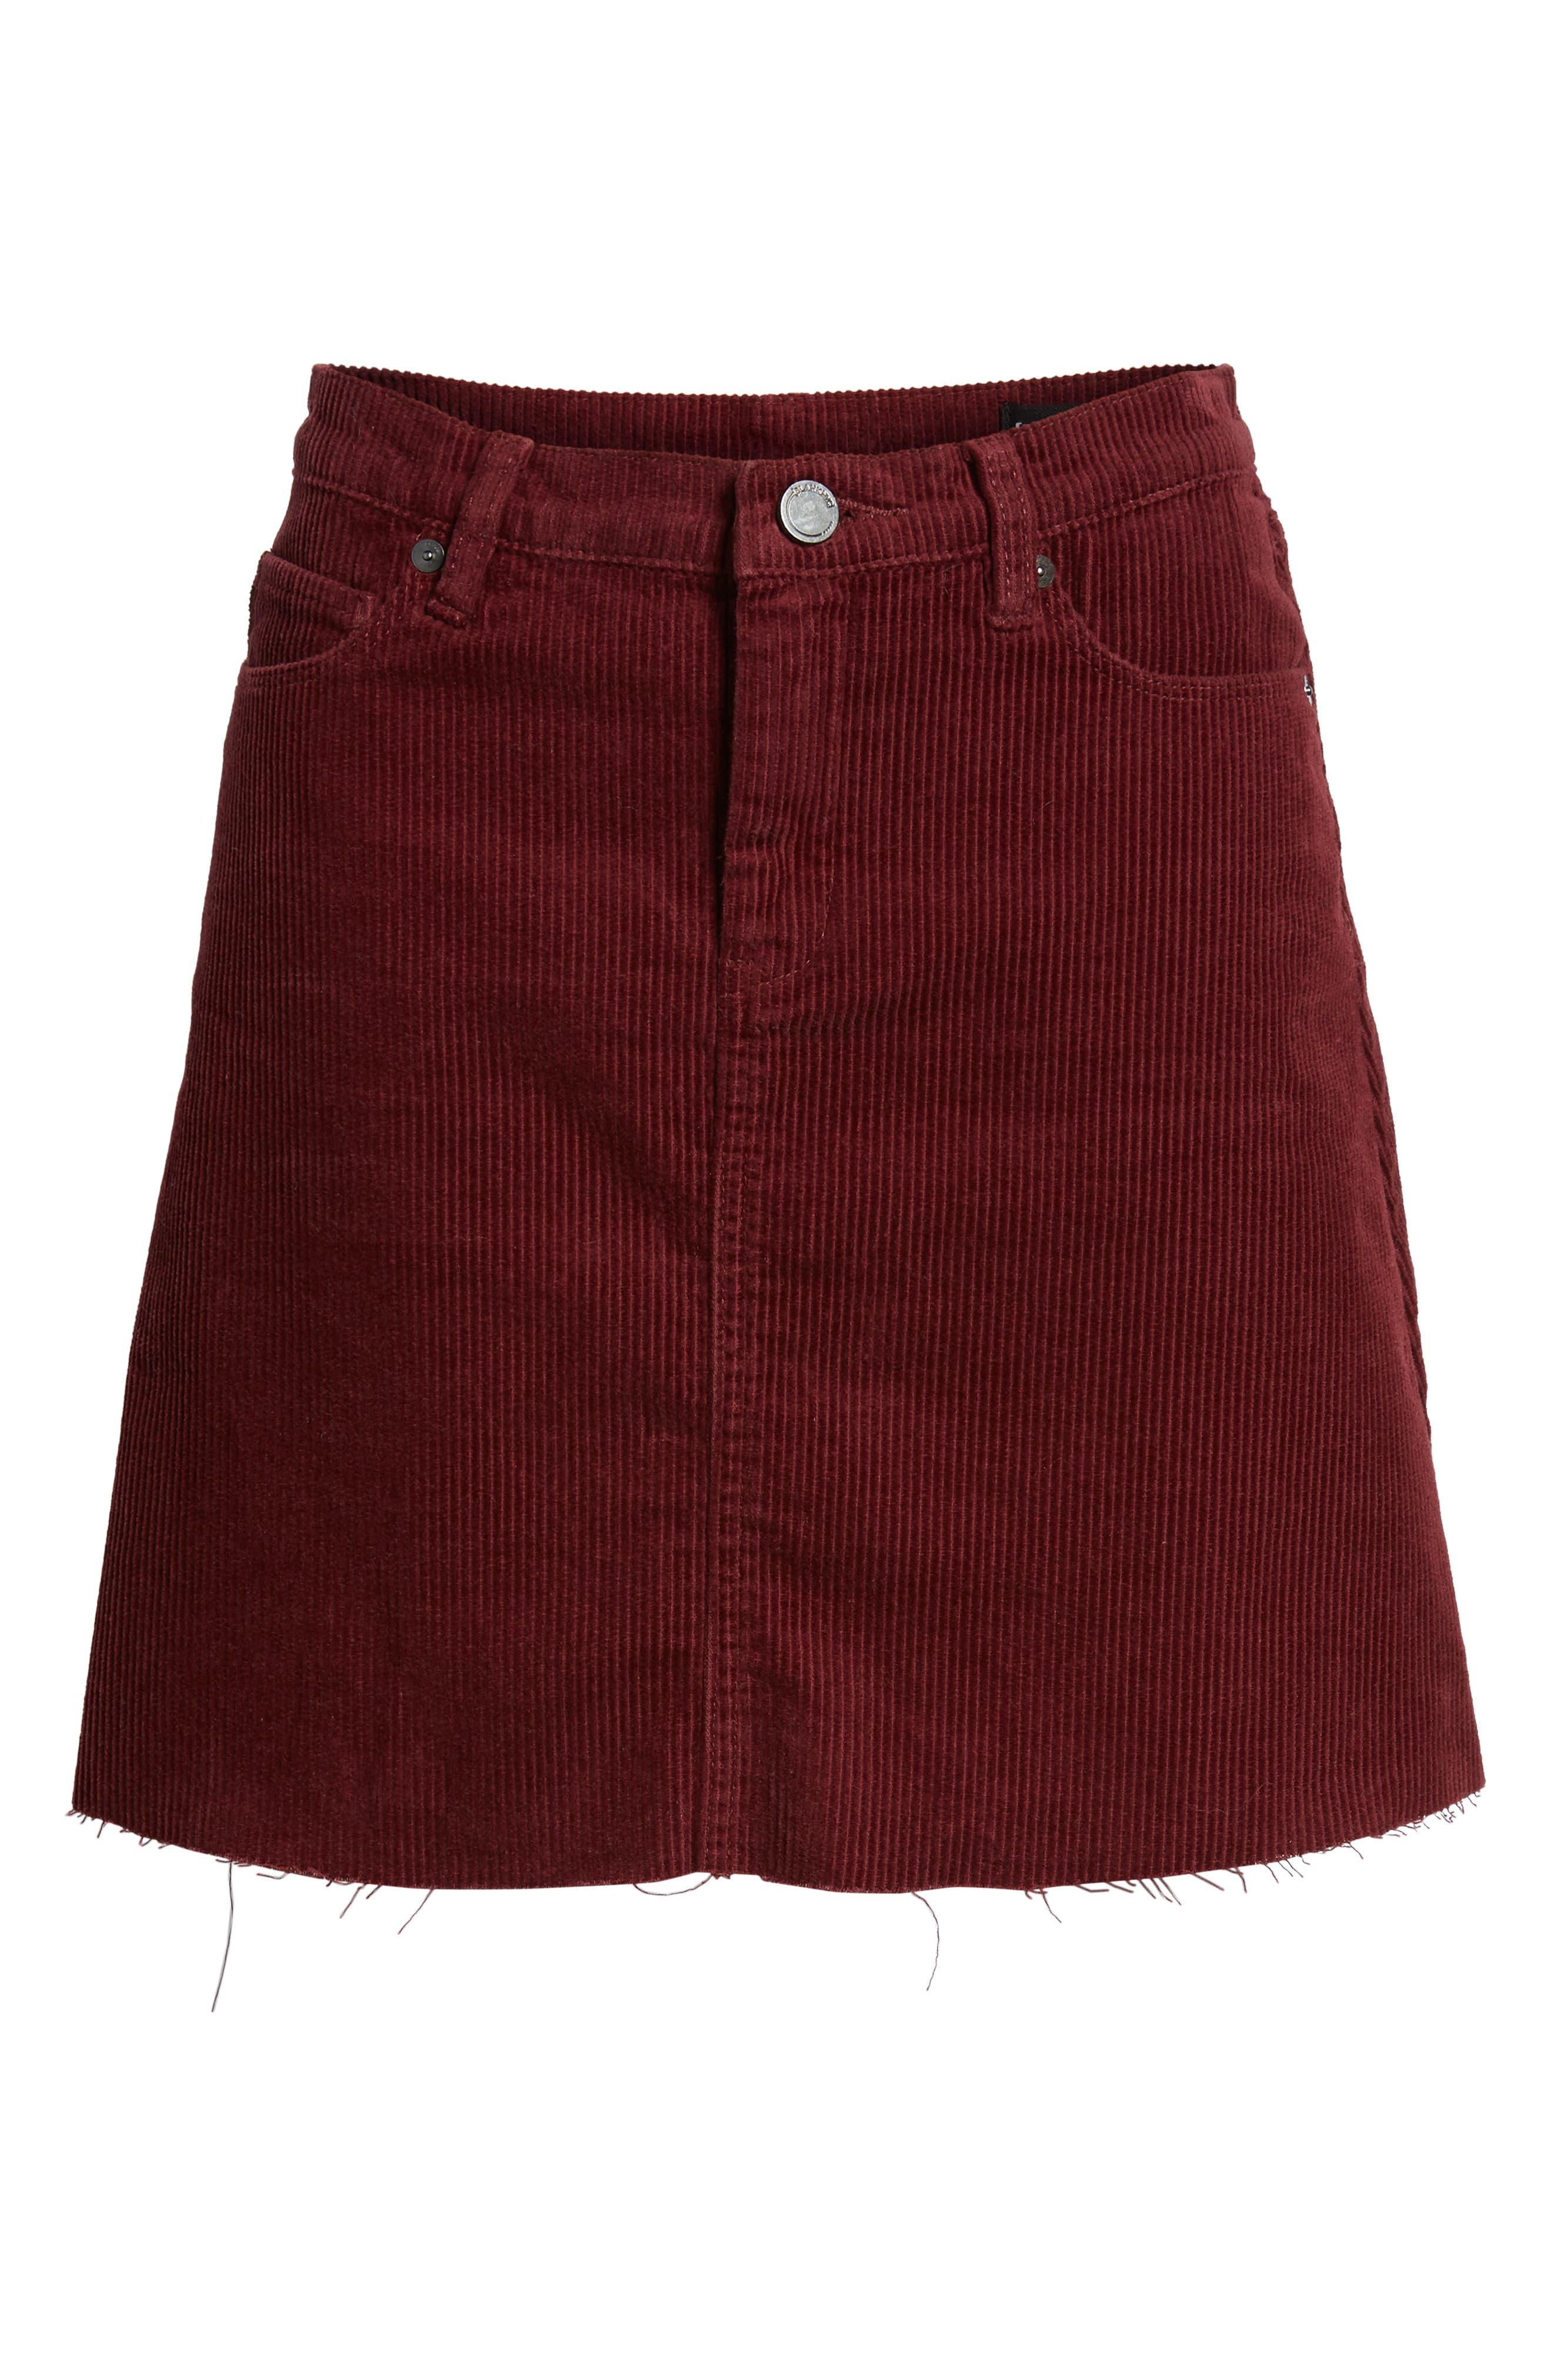 Corduroy A-Line Miniskirt,                             Alternate thumbnail 6, color,                             MERLOT